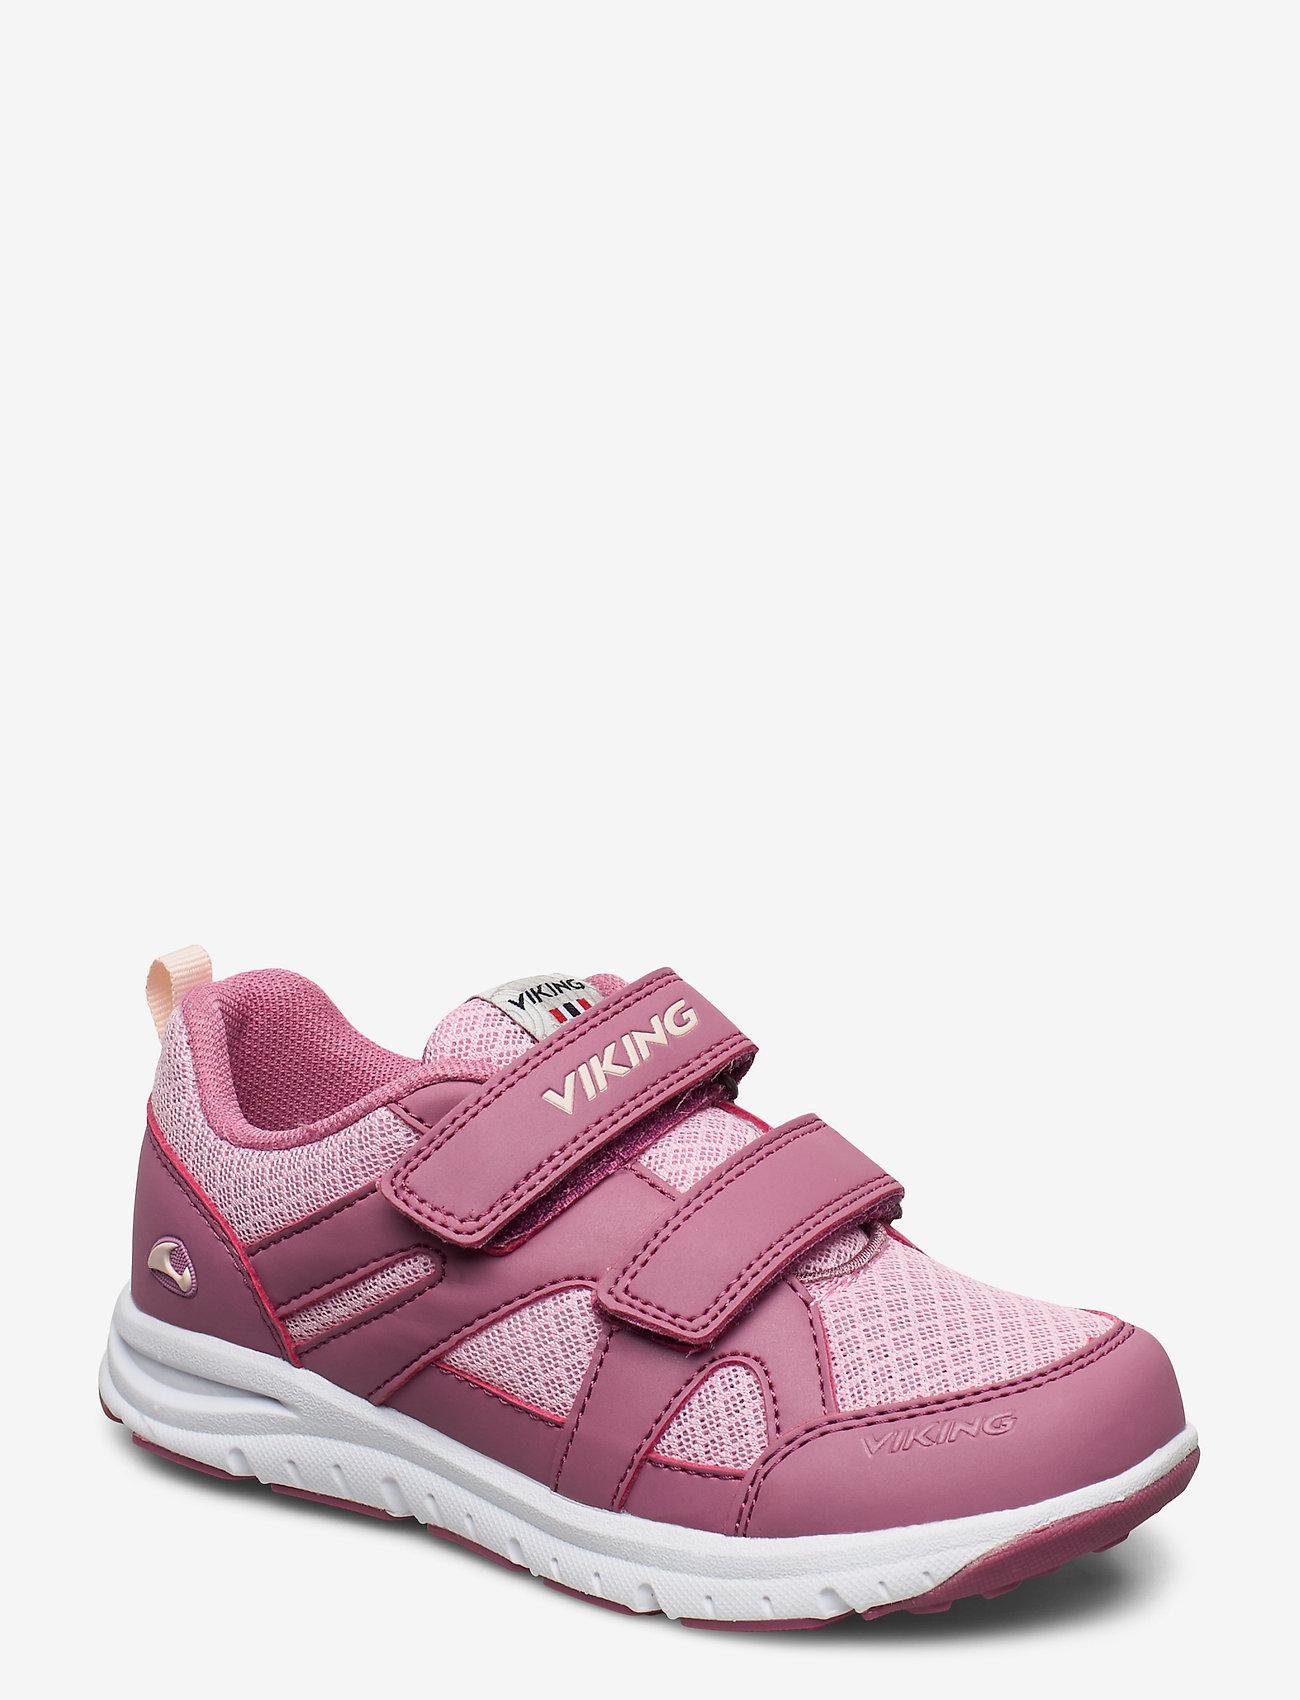 Viking - Odda - low-top sneakers - pink/violet - 0